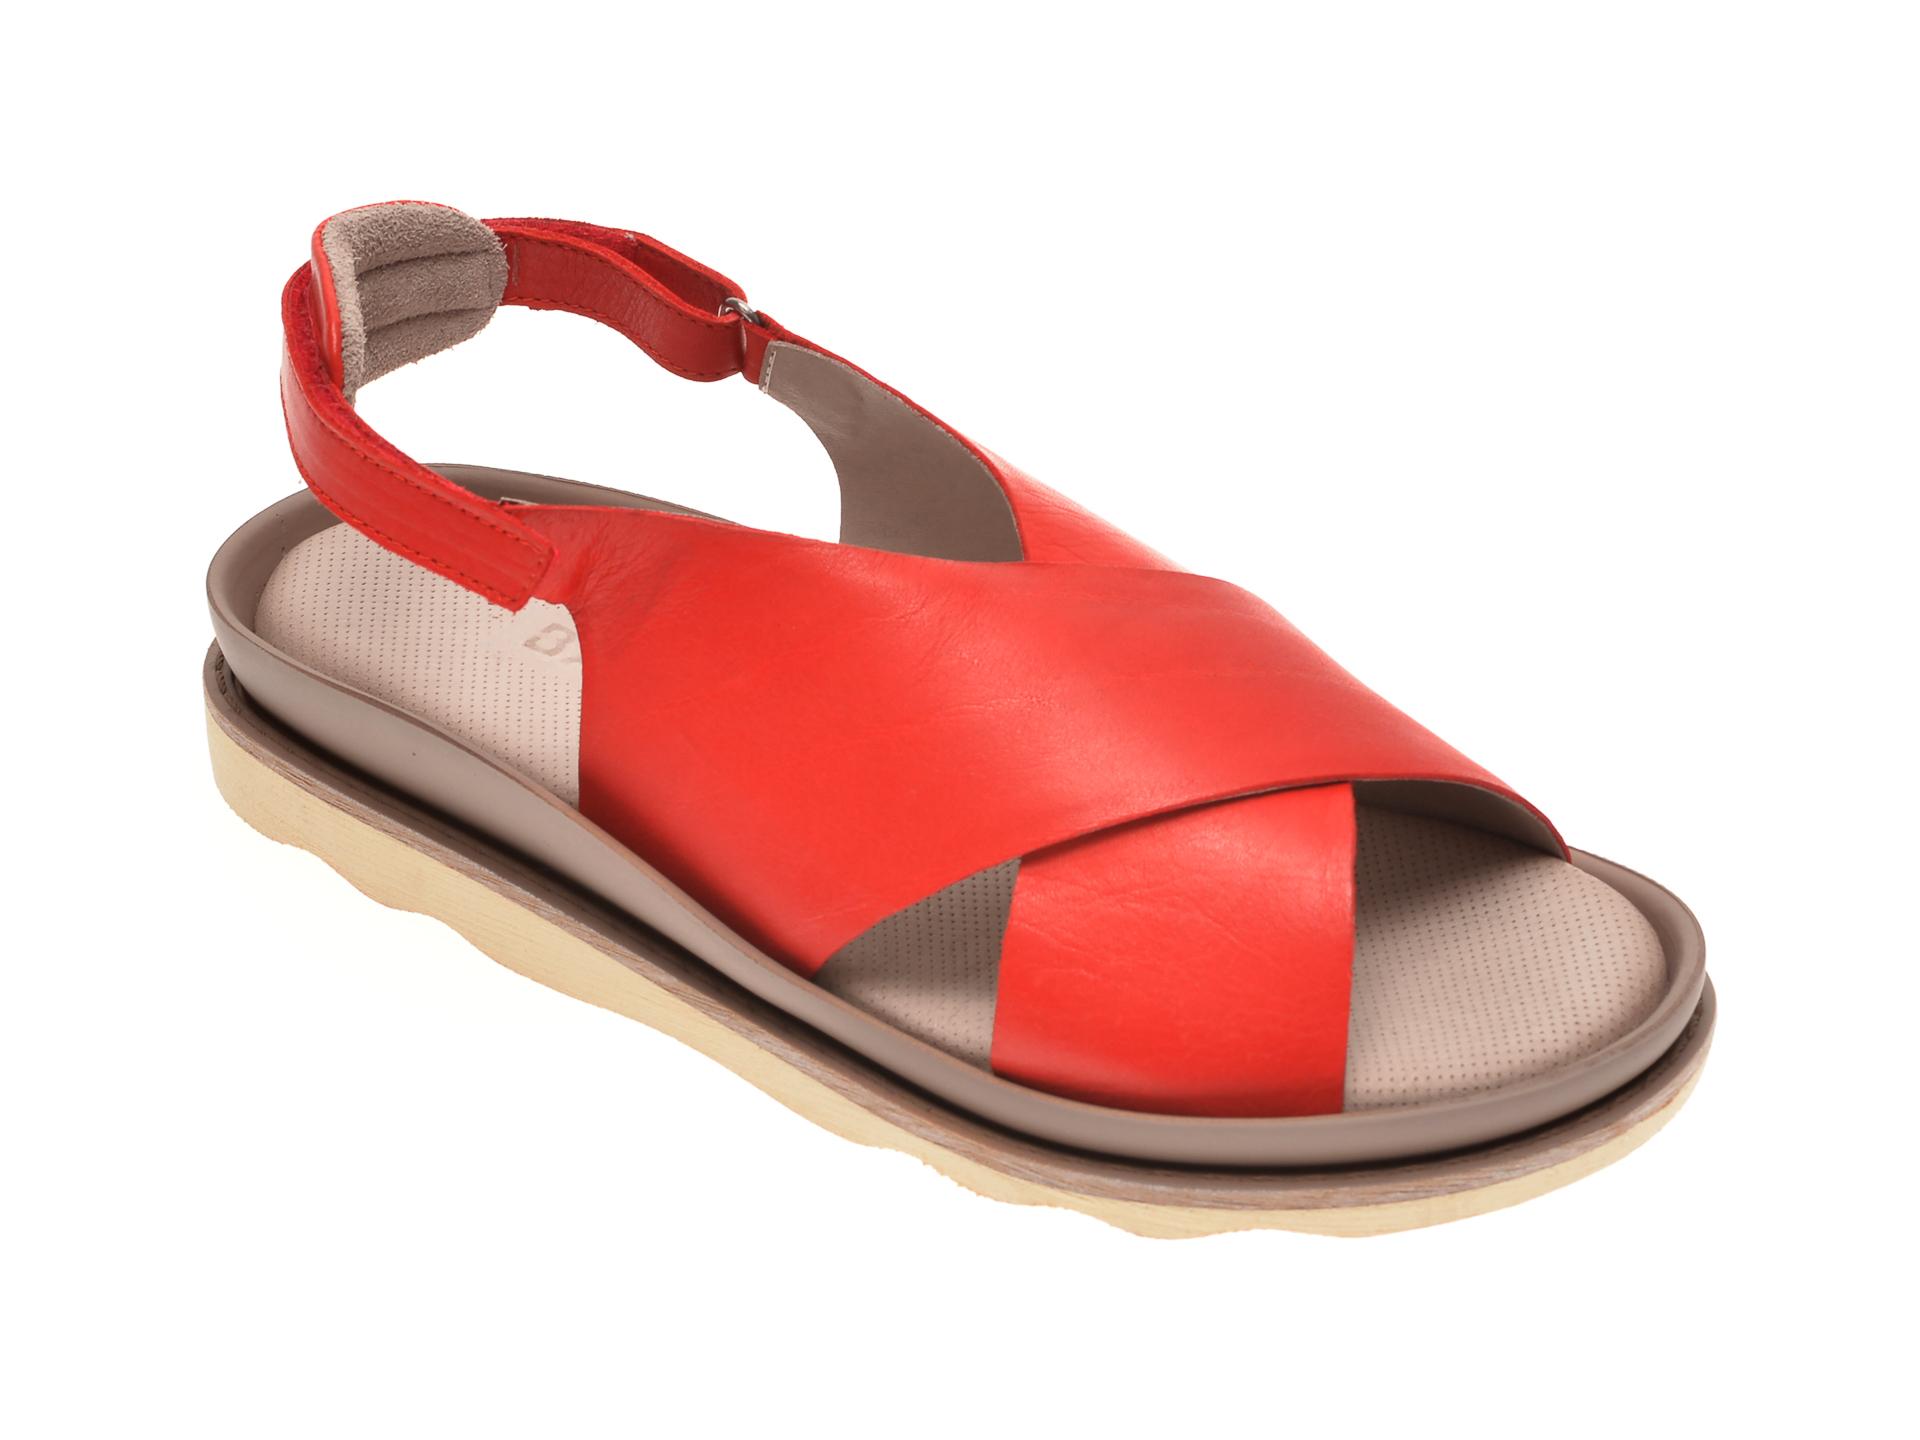 Sandale BABOOS rosii, 0403, din piele naturala